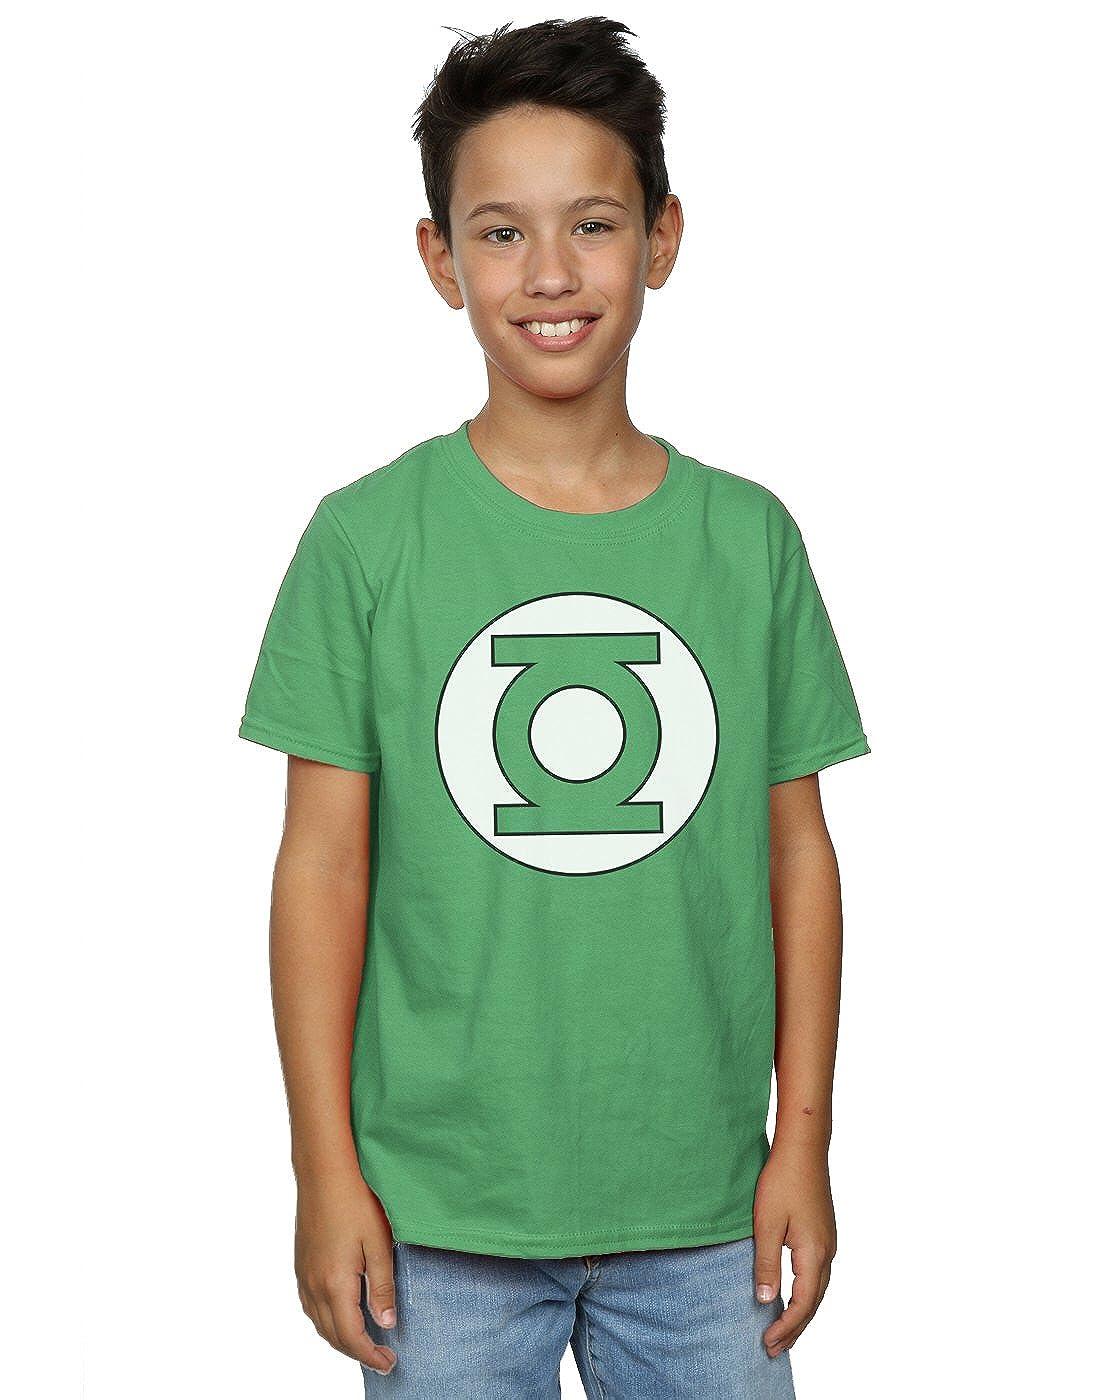 ce0d188fe Amazon.com: DC Comics Boys Green Lantern Logo T-Shirt: Clothing